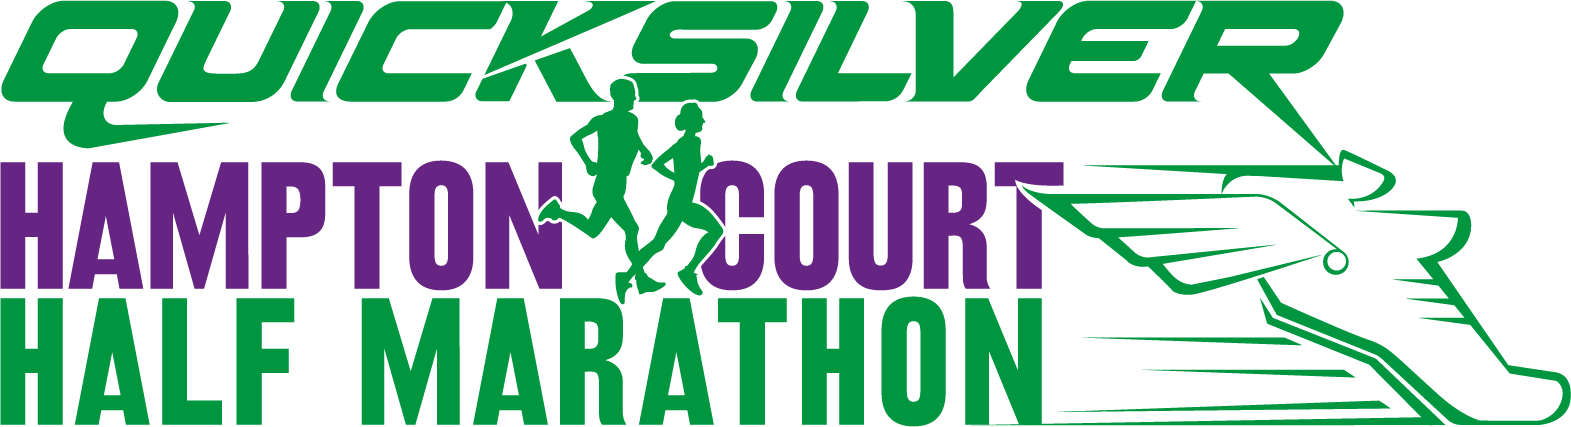 The Quicksilver Hampton Court Half Marathon - cover image